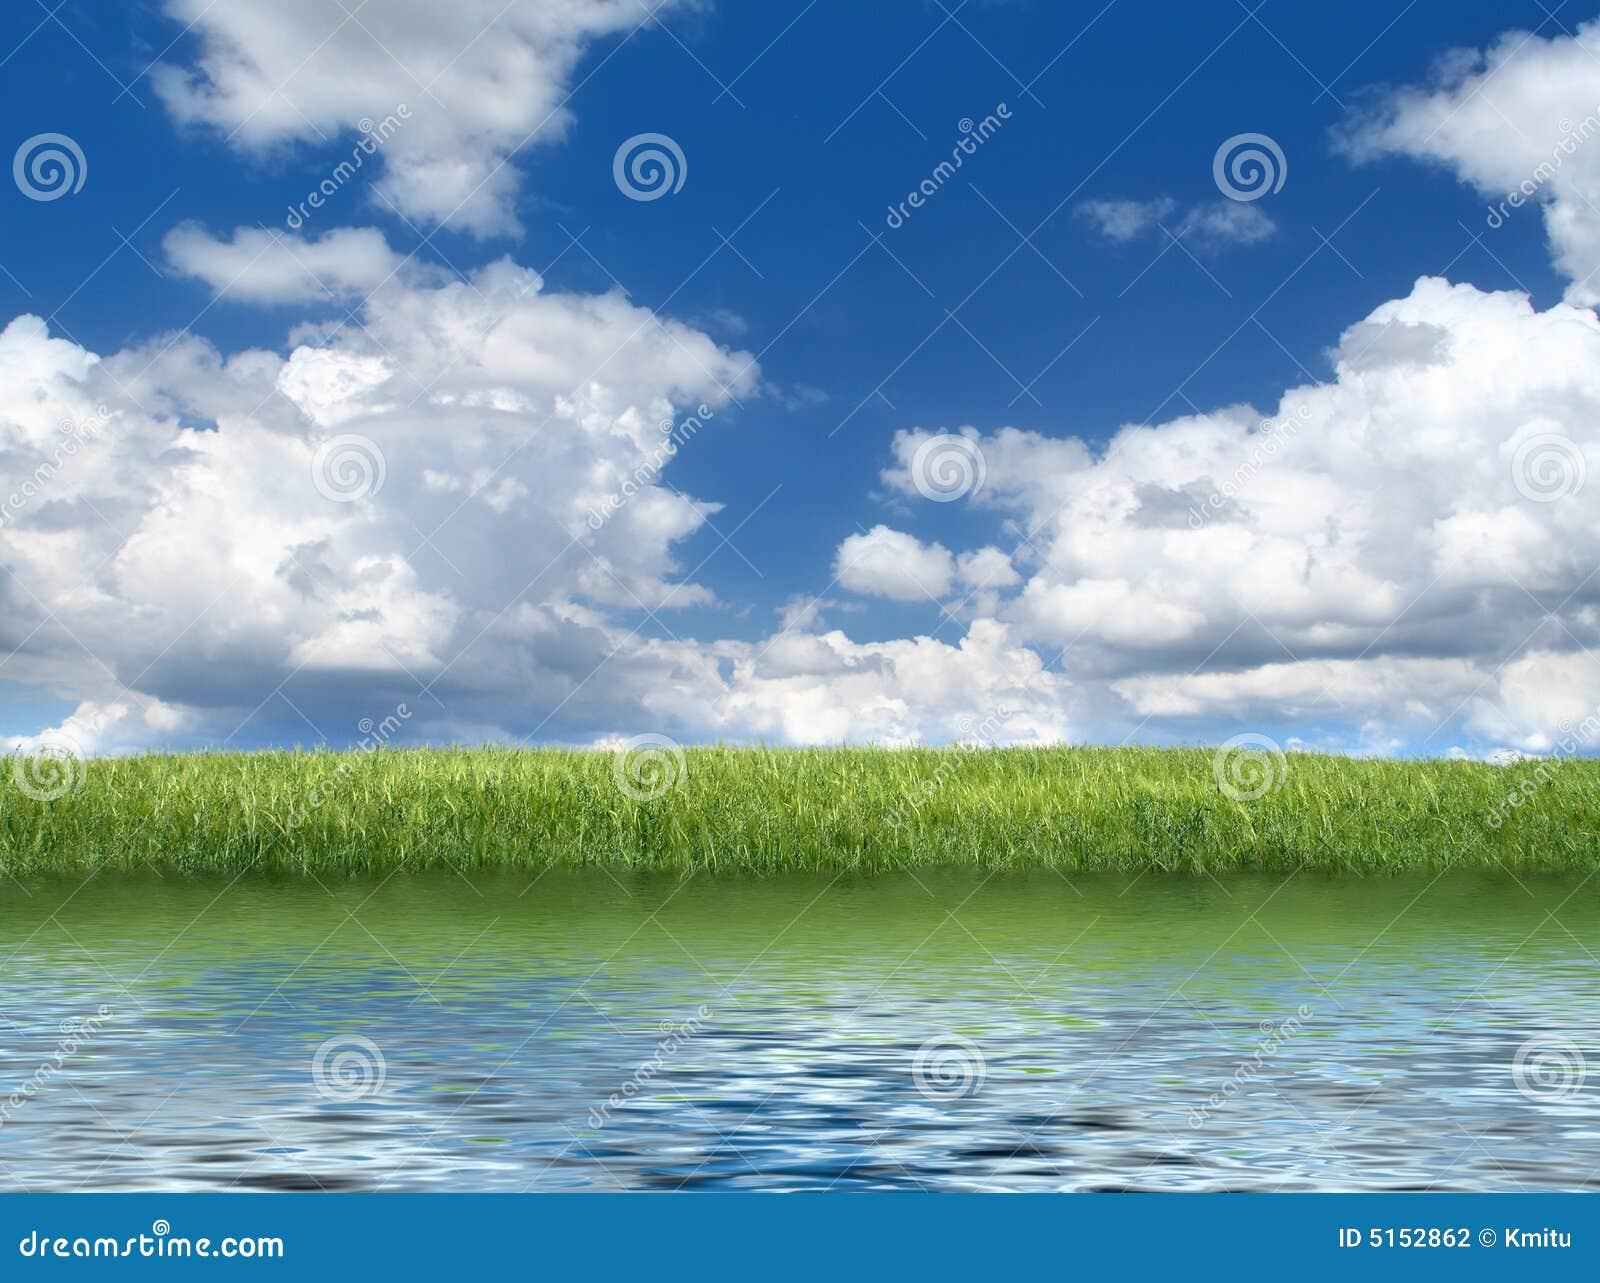 grassfield绿色湖边